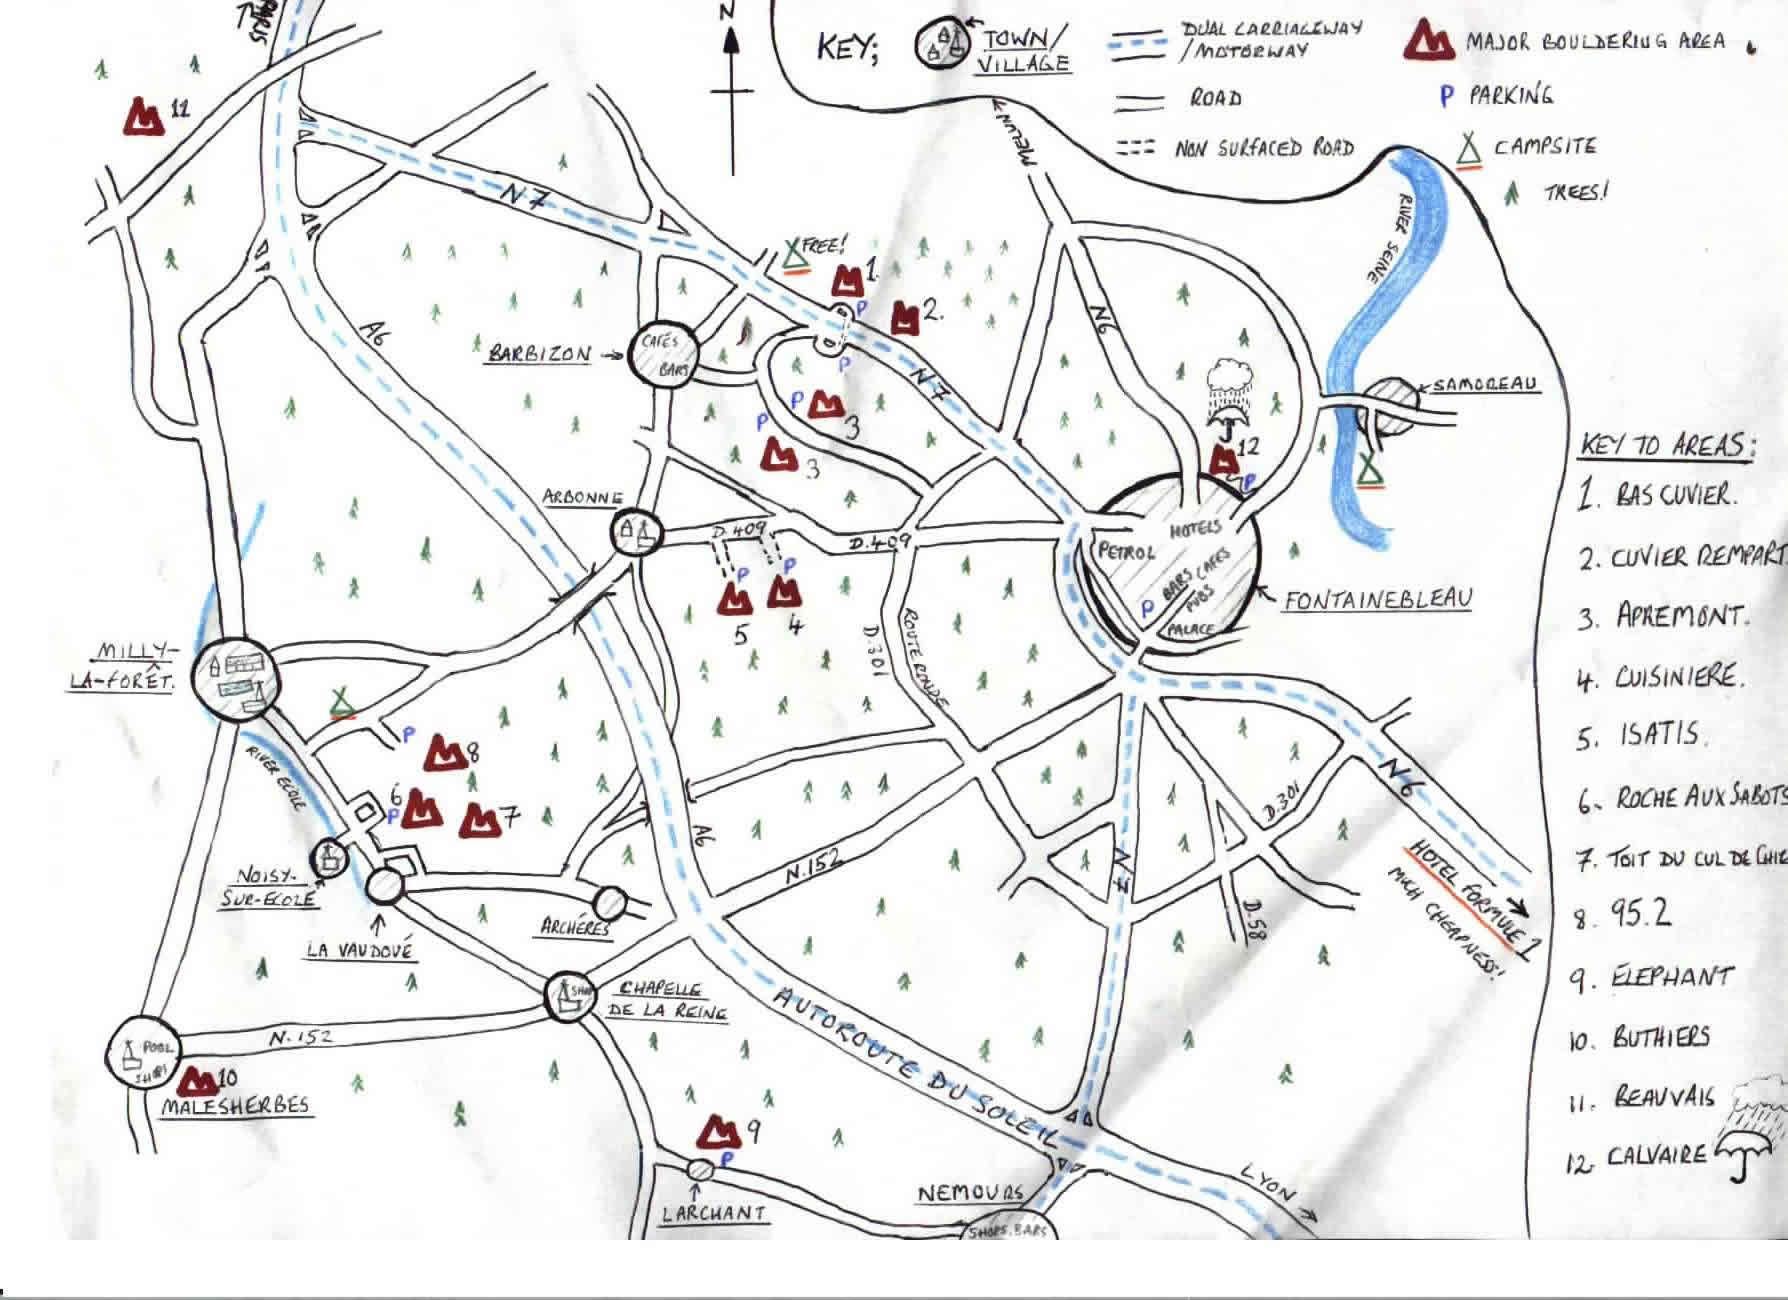 Filefont A Rough Guide Mapjpg Scottishclimbs